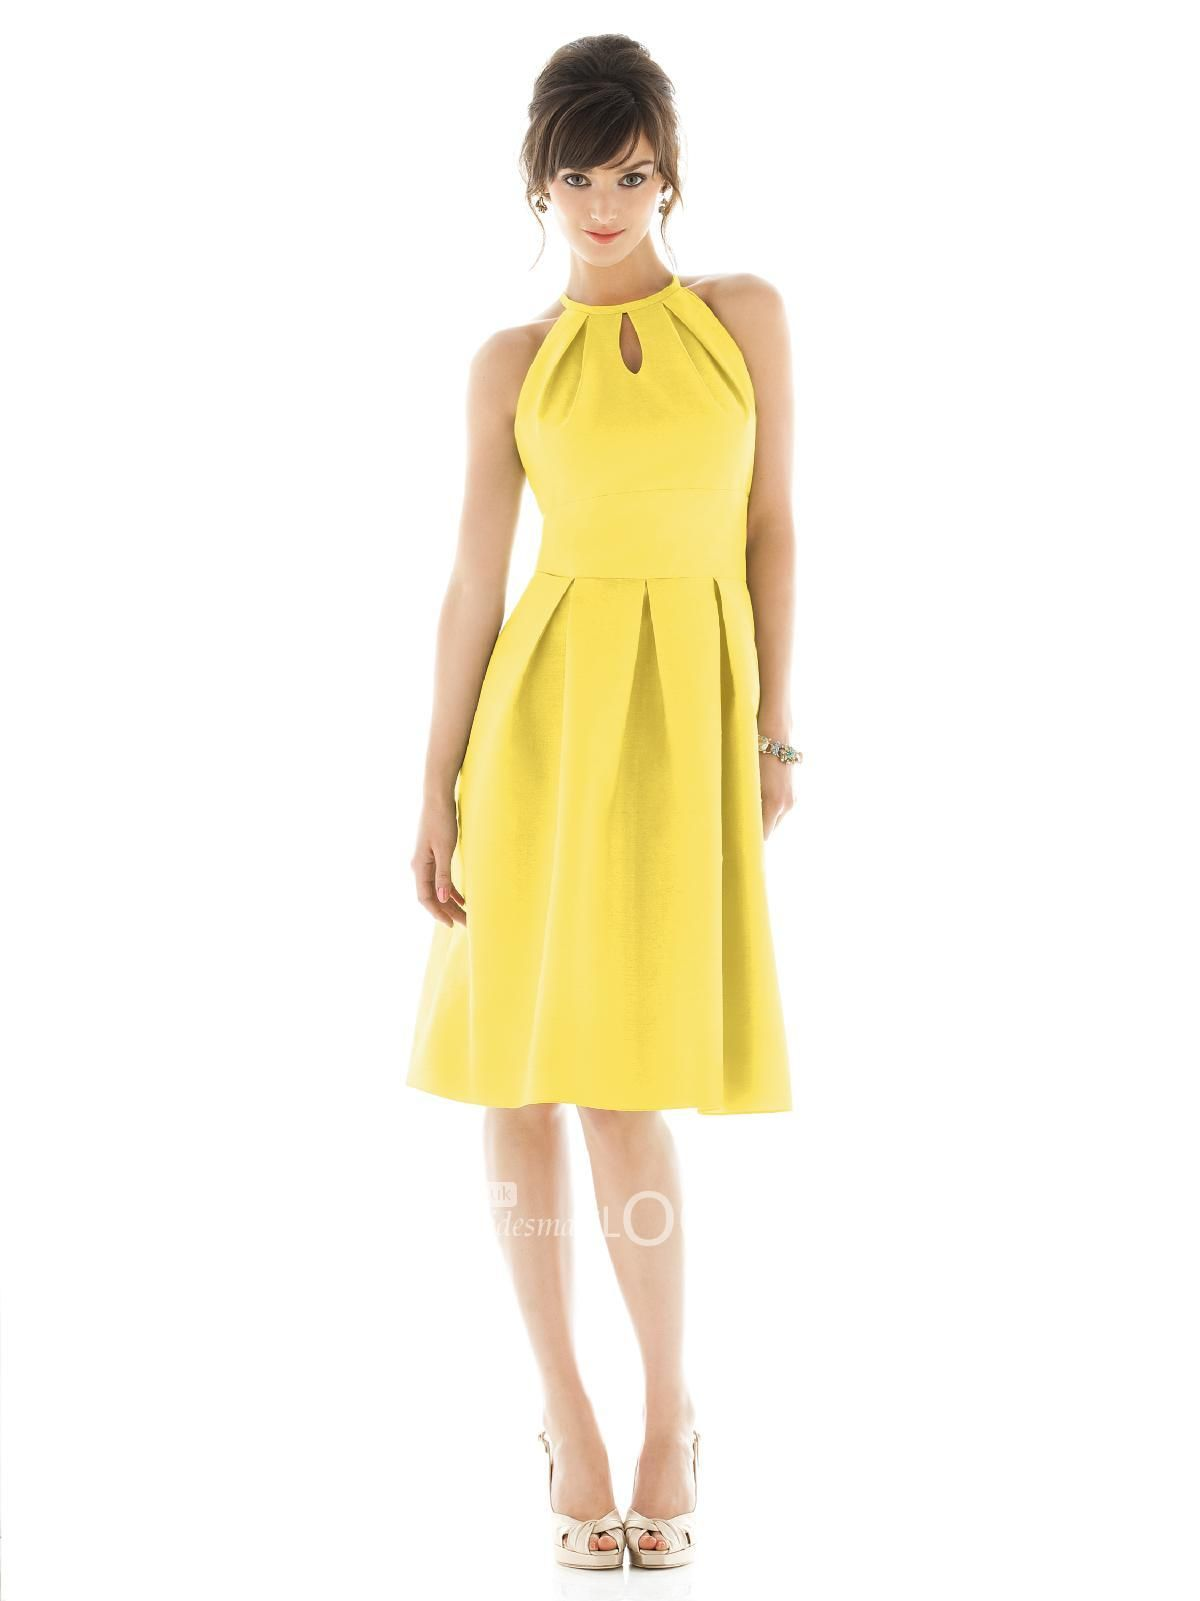 yellow short halter bridesmaid dress with keyhole neckline